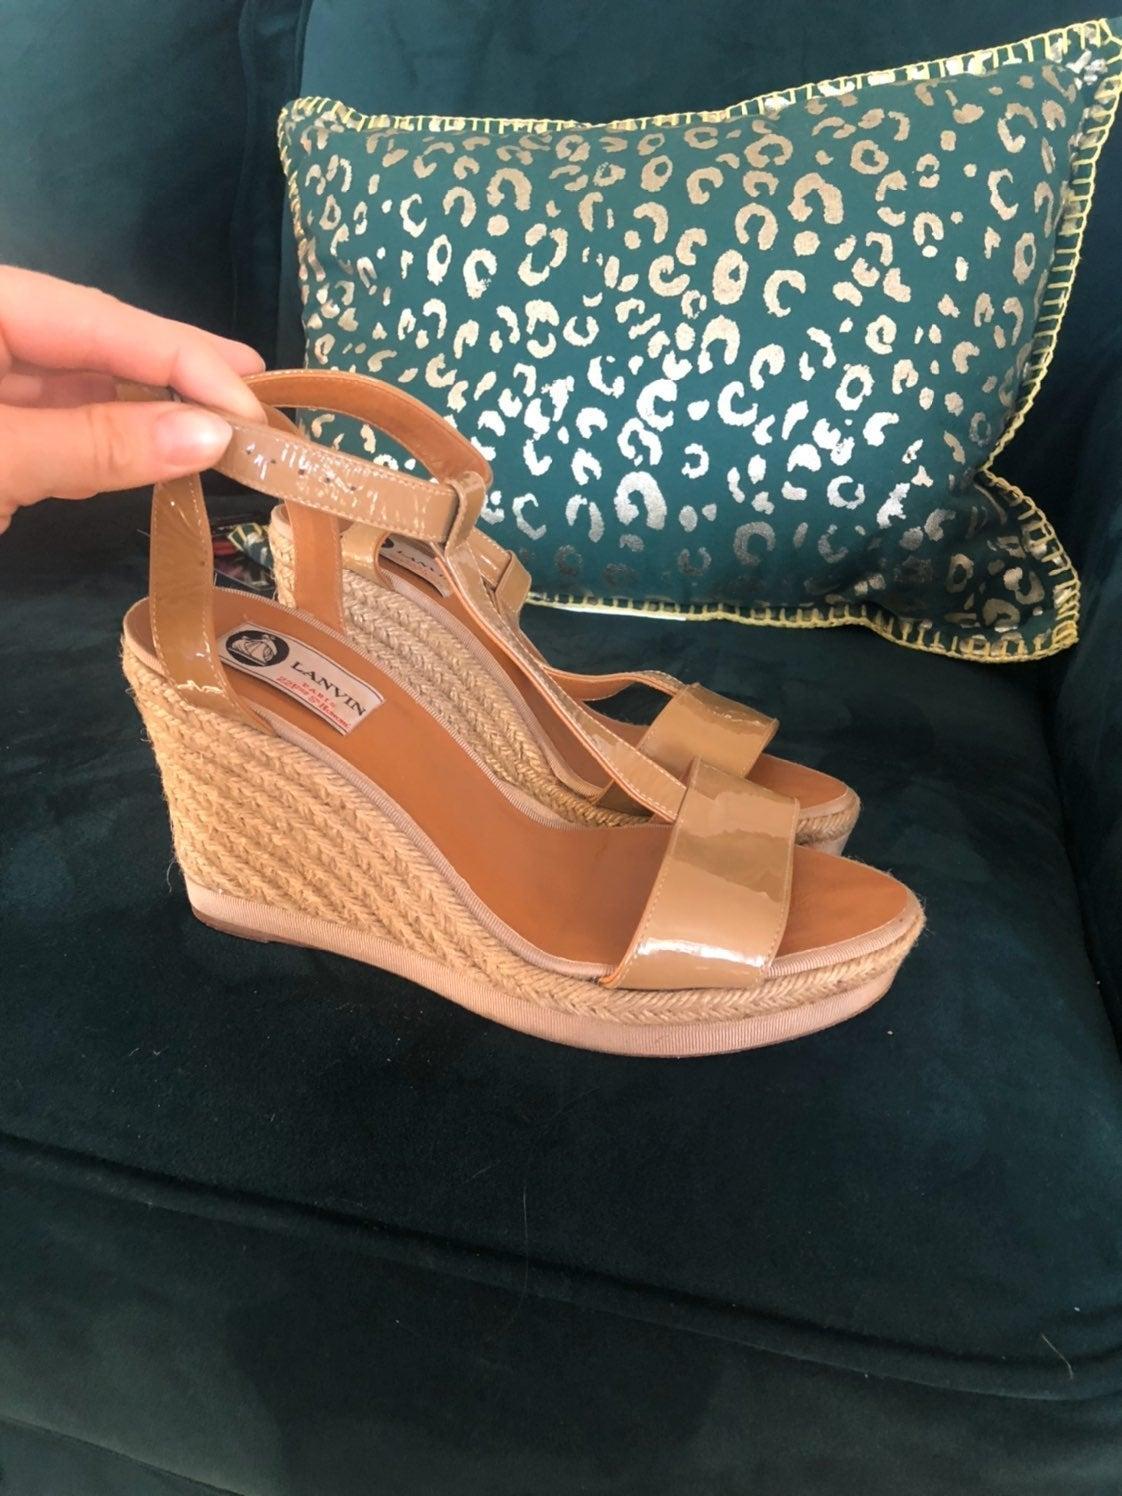 Lanvin Beige Patent Leather Espadrilles